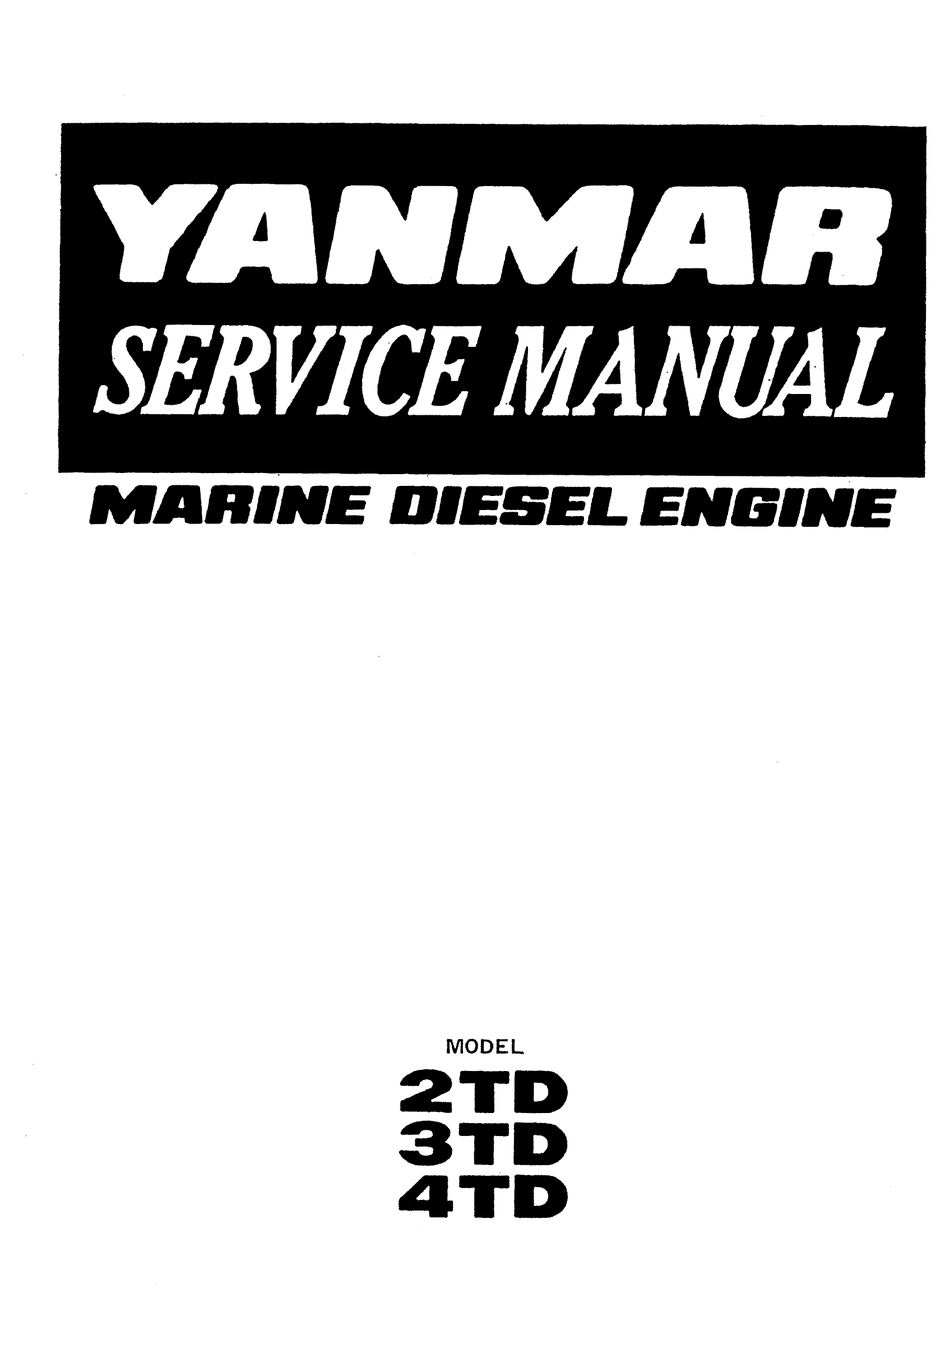 Yanmar 2td Service Manual Pdf Download Manualslib